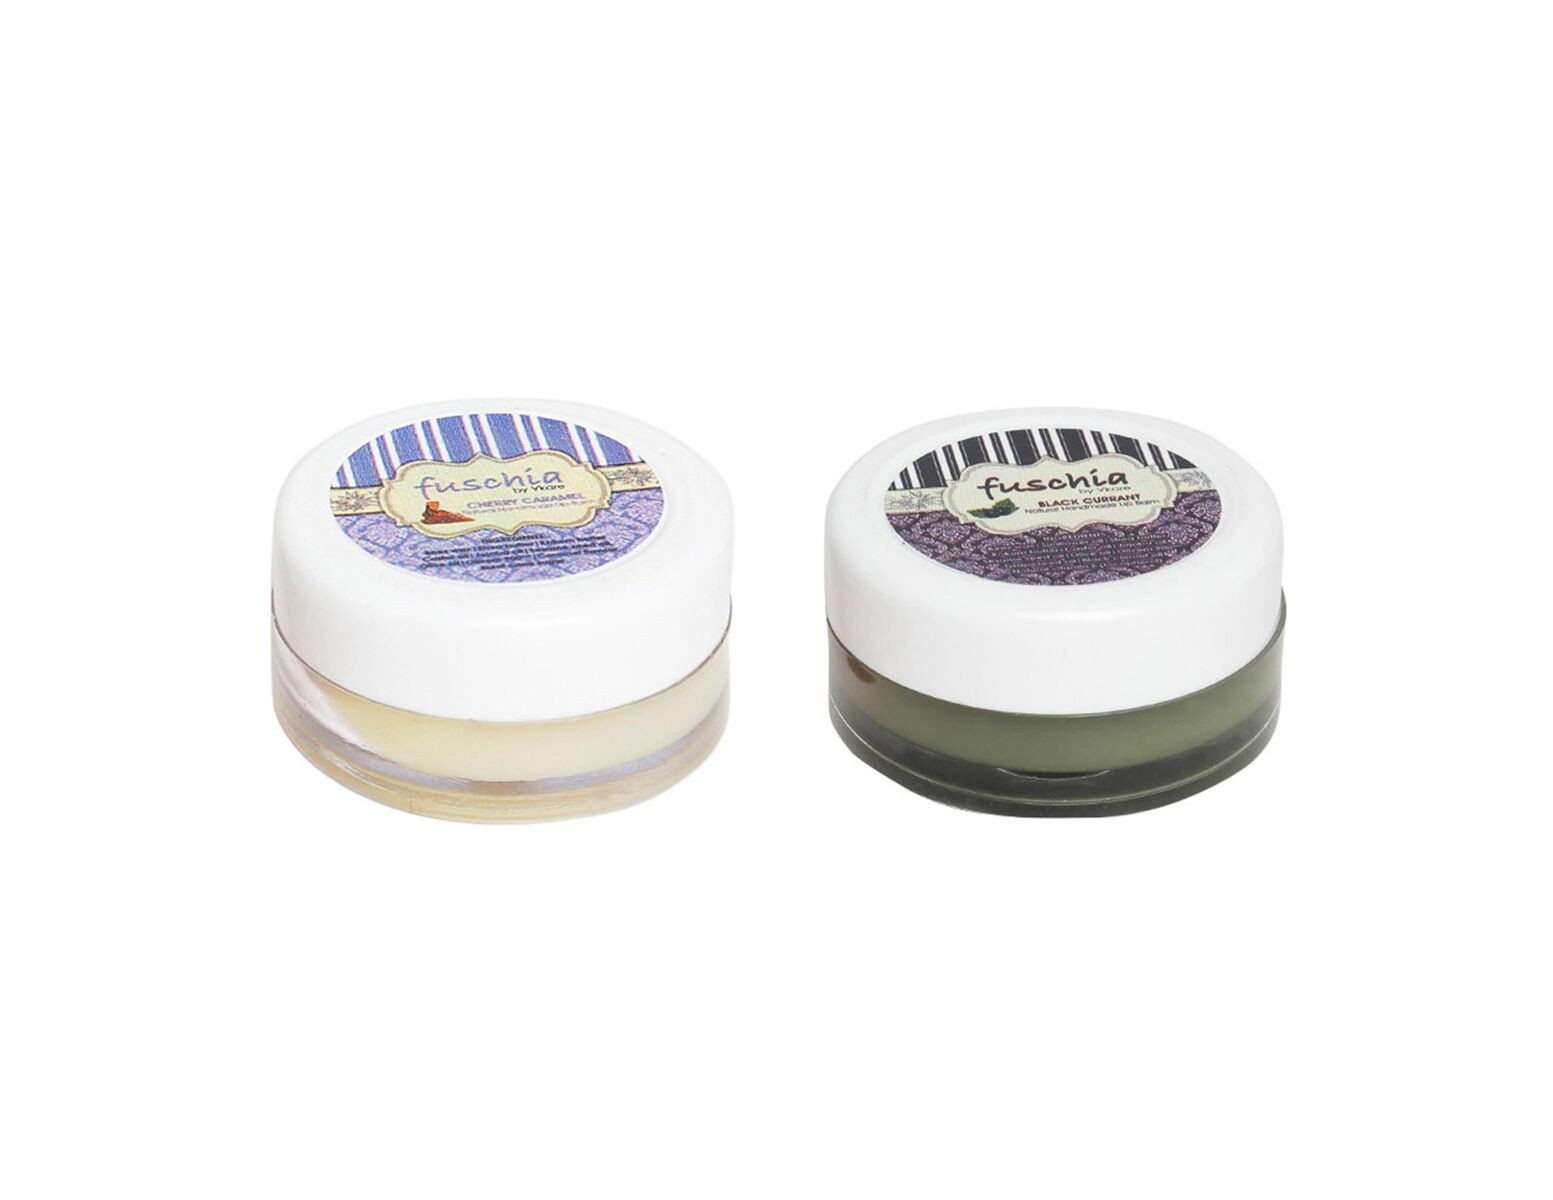 Fuschia – Caramel & Black Currant Lip Balm Combo 16gm